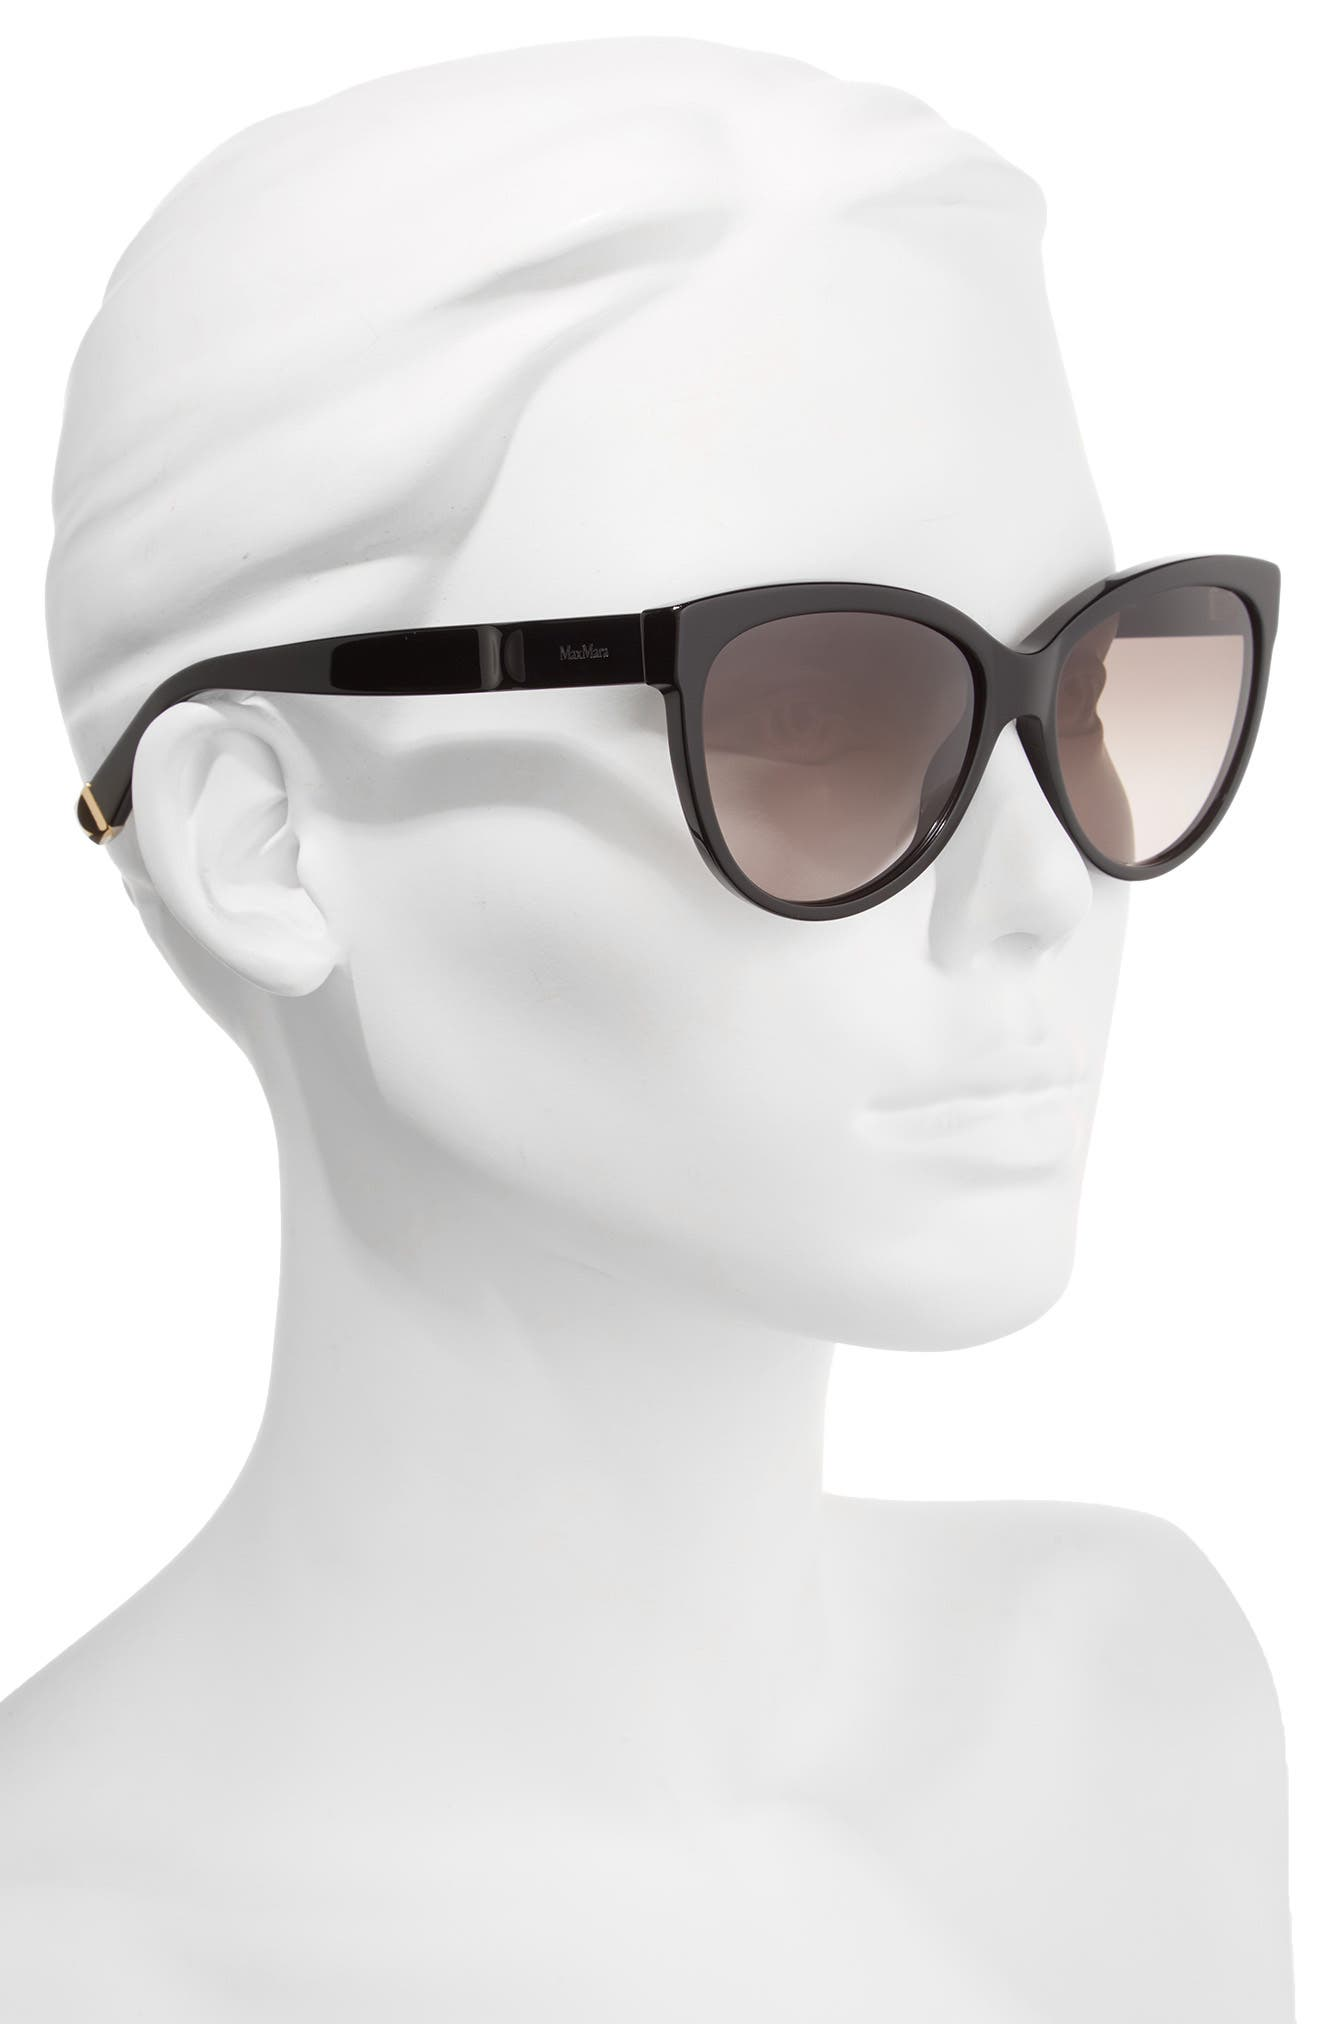 Moderii 57mm Gradient Cat Eye Sunglasses,                             Alternate thumbnail 2, color,                             001